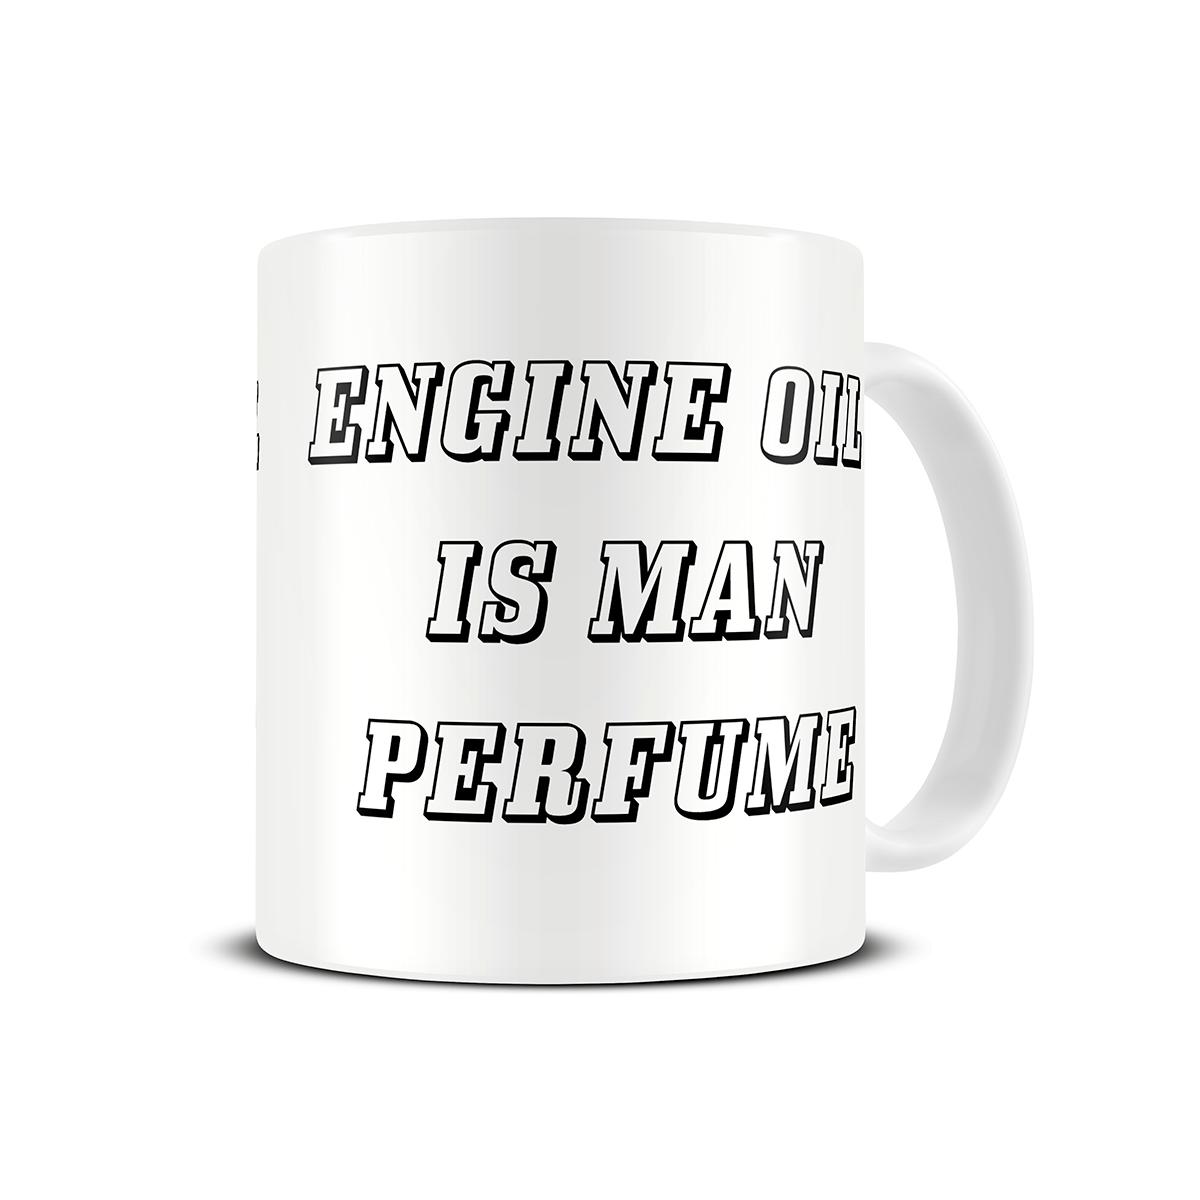 mechanic-gift-mug-engine-oil-is-man-perfume